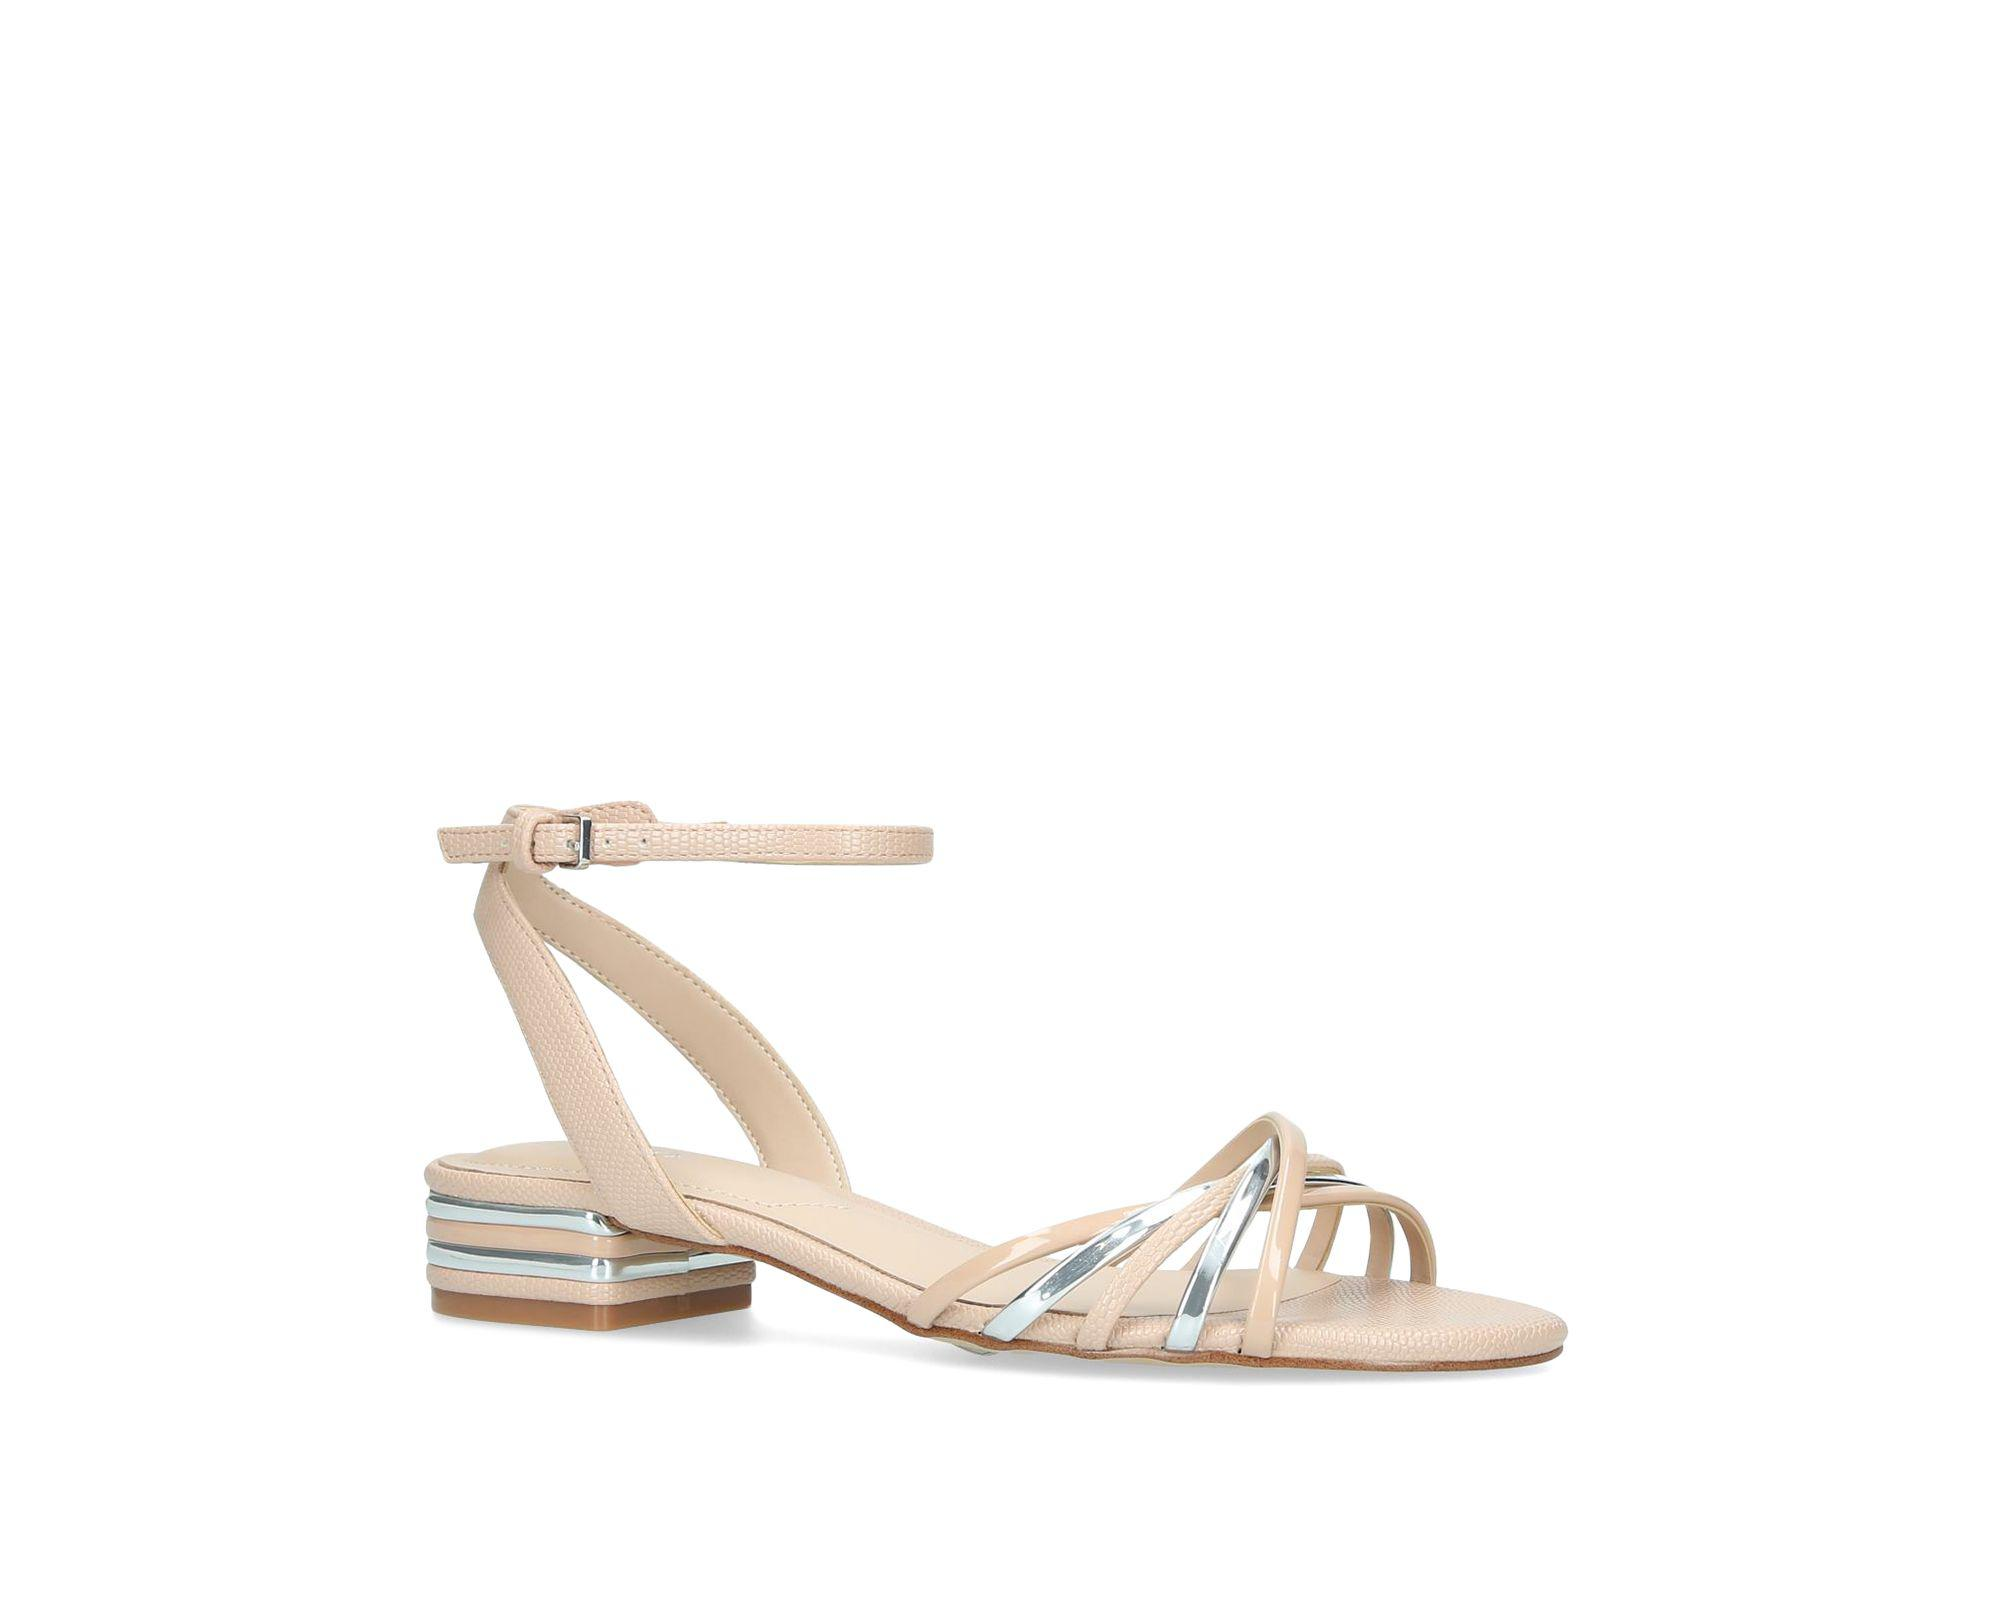 922088c76b4 ALDO Metallic  legaecia  Open Toe Sandals in Pink - Lyst